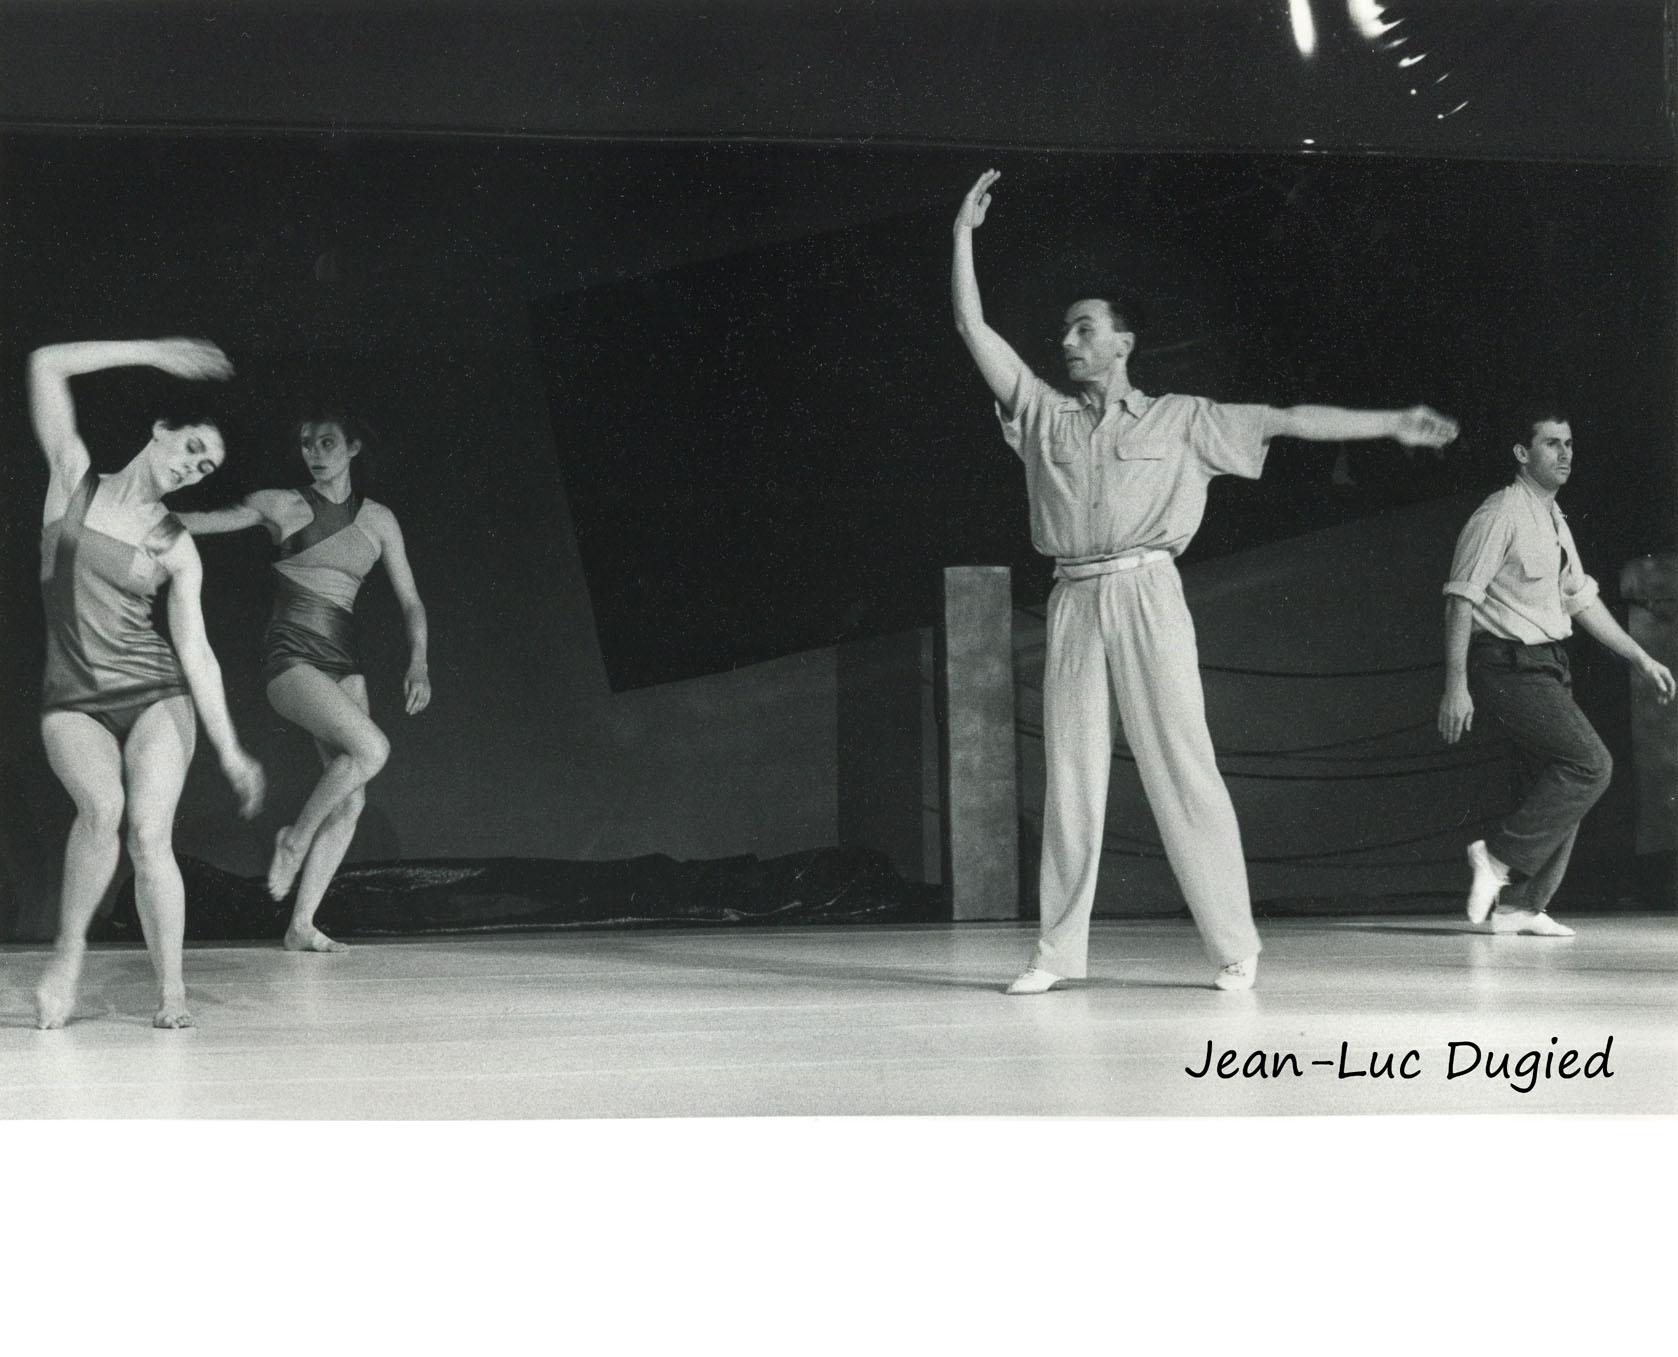 39 Ramseyer Jean-Claude - clichés en déroute - 1985